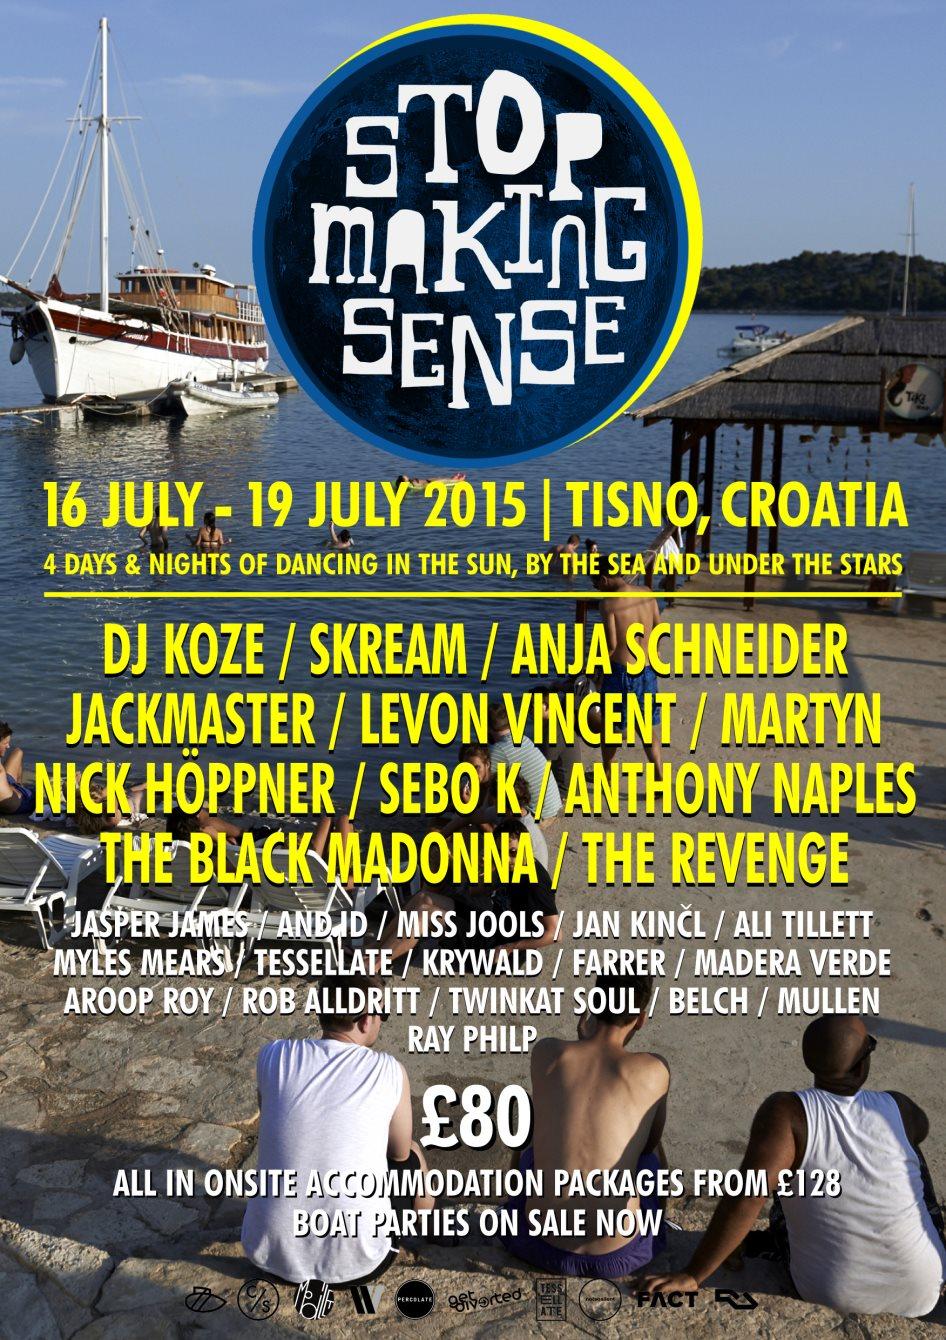 Stop Making Sense 2015 - Flyer front